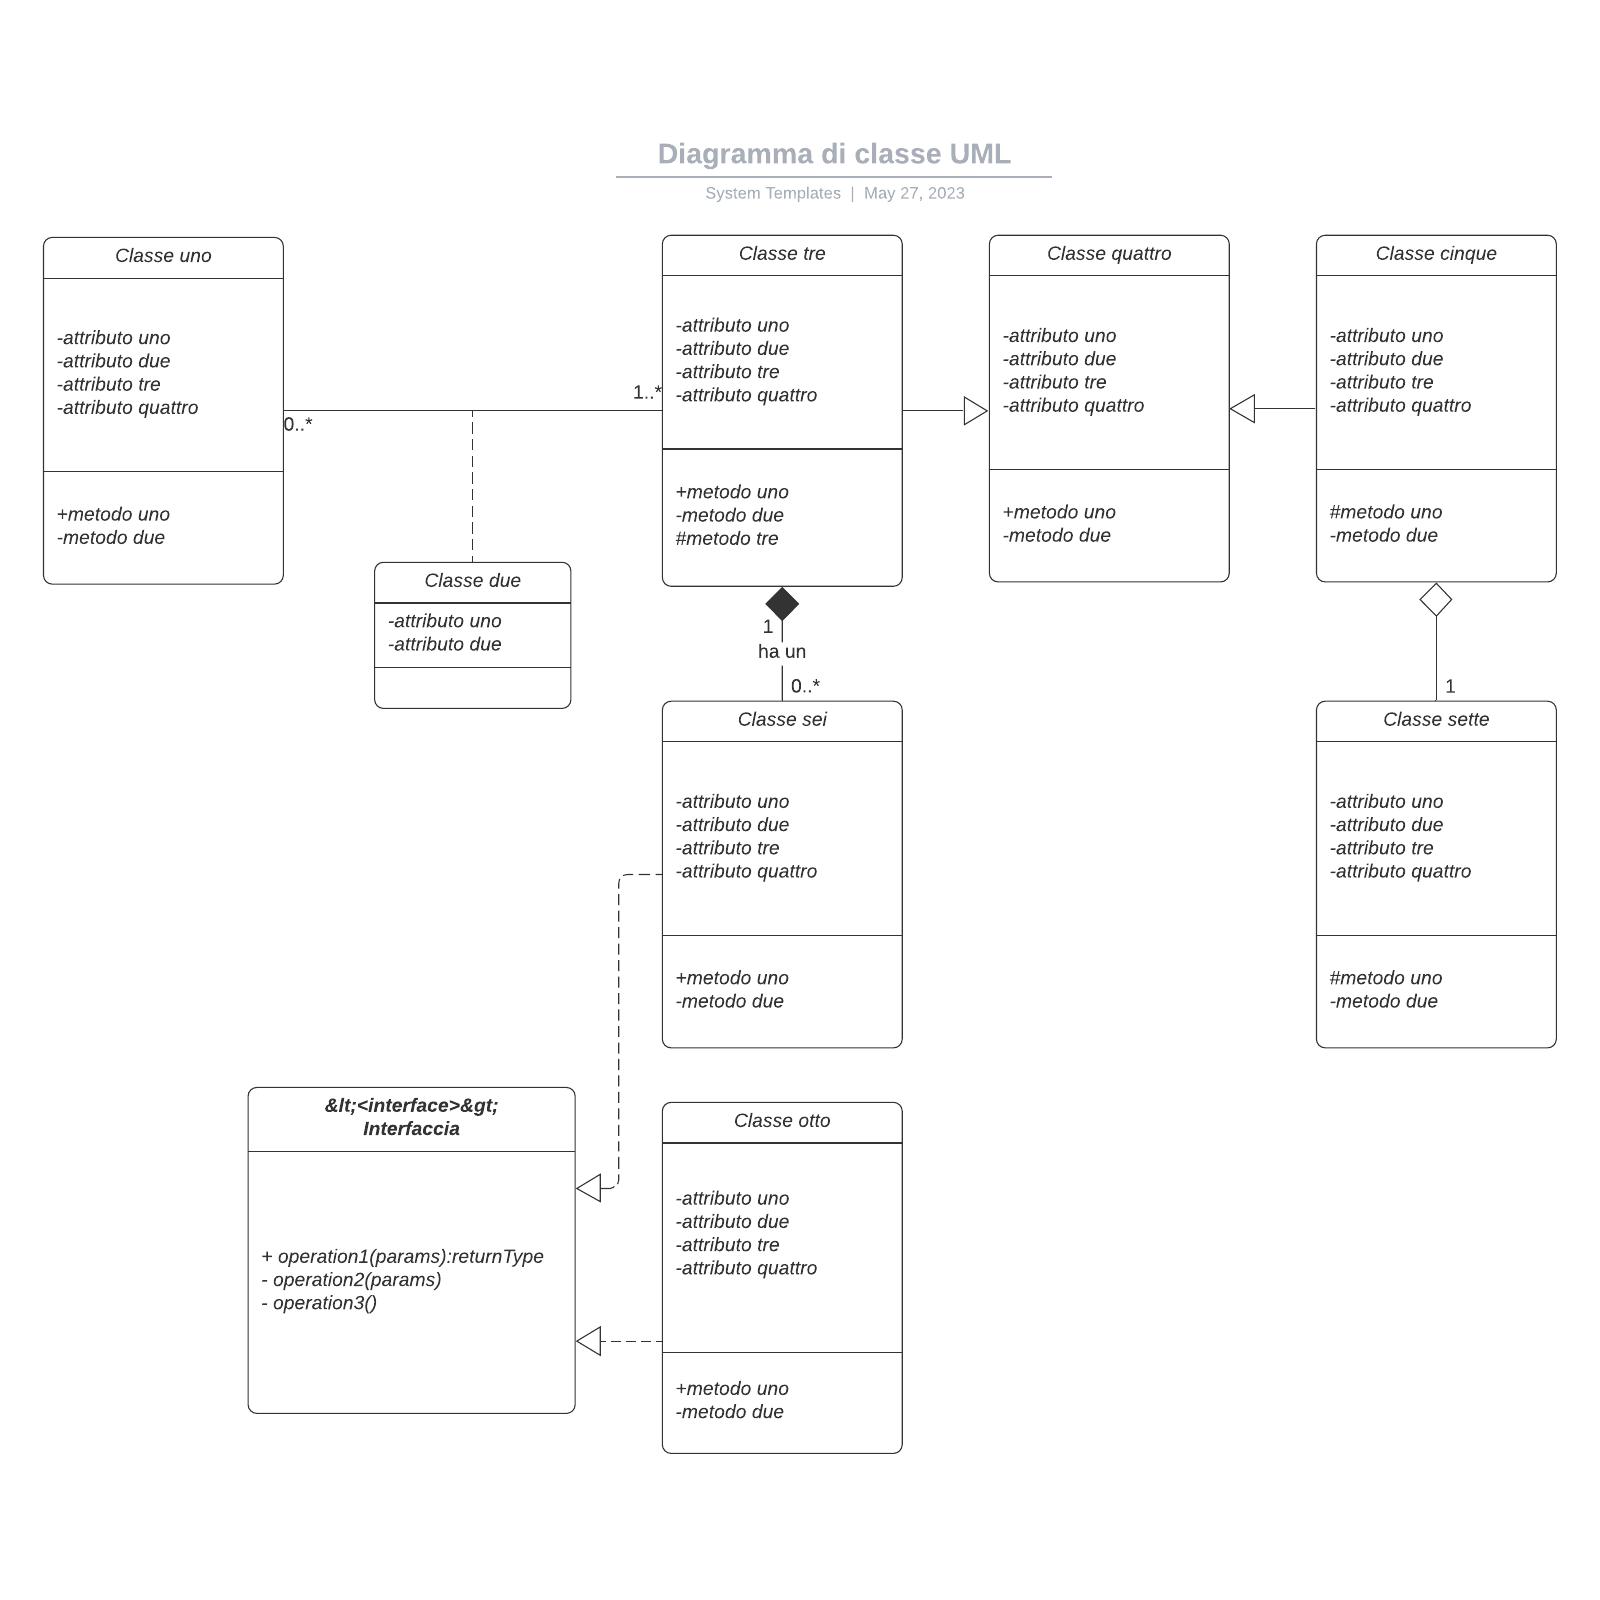 Diagramma di classe UML